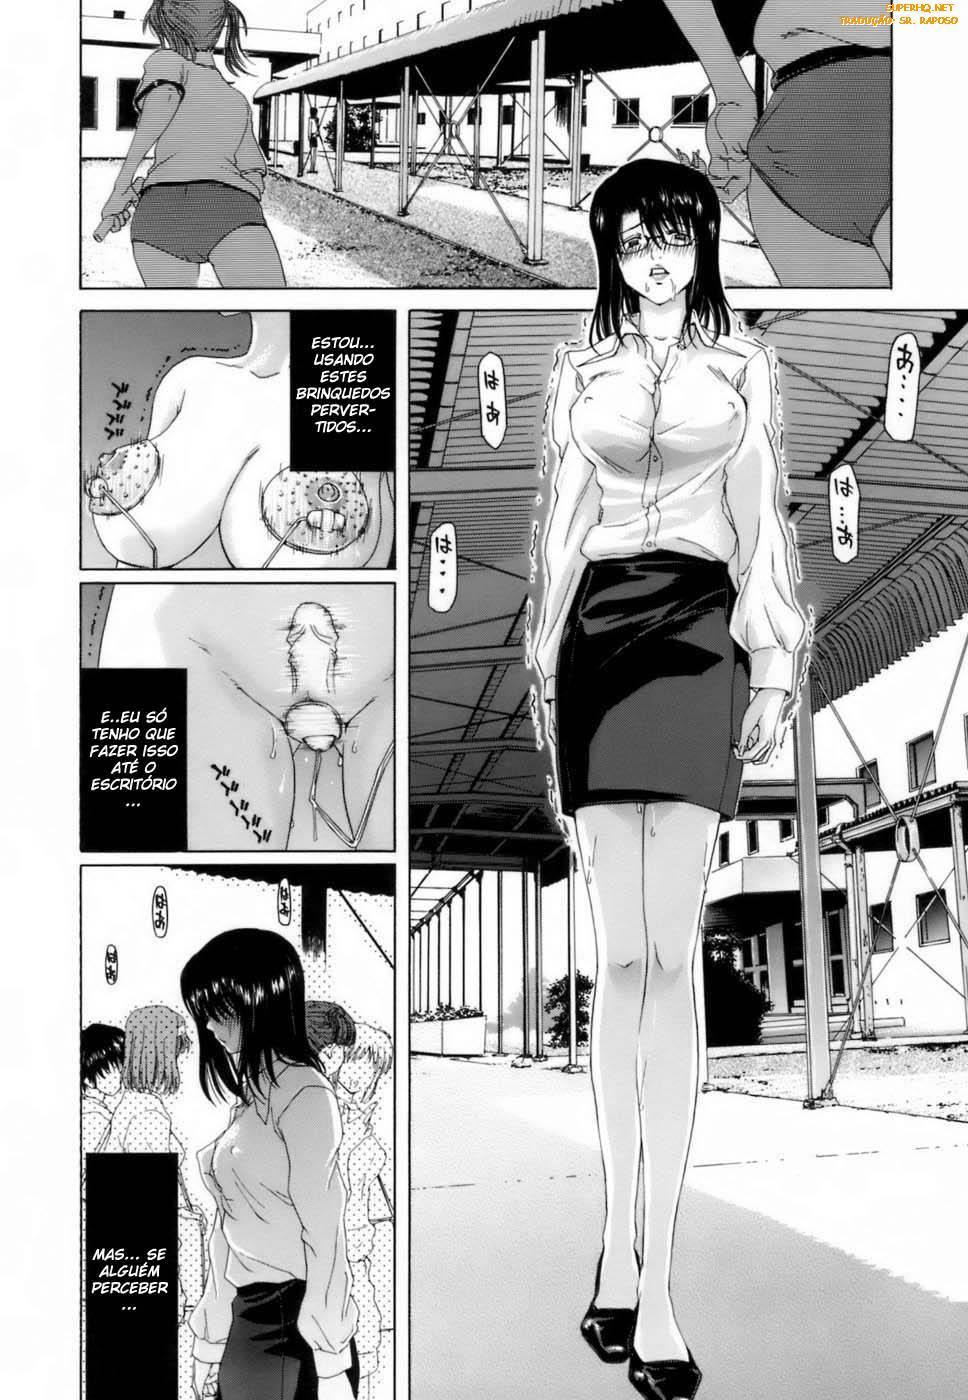 Hentaihome-Minha-professora-pervertida-6